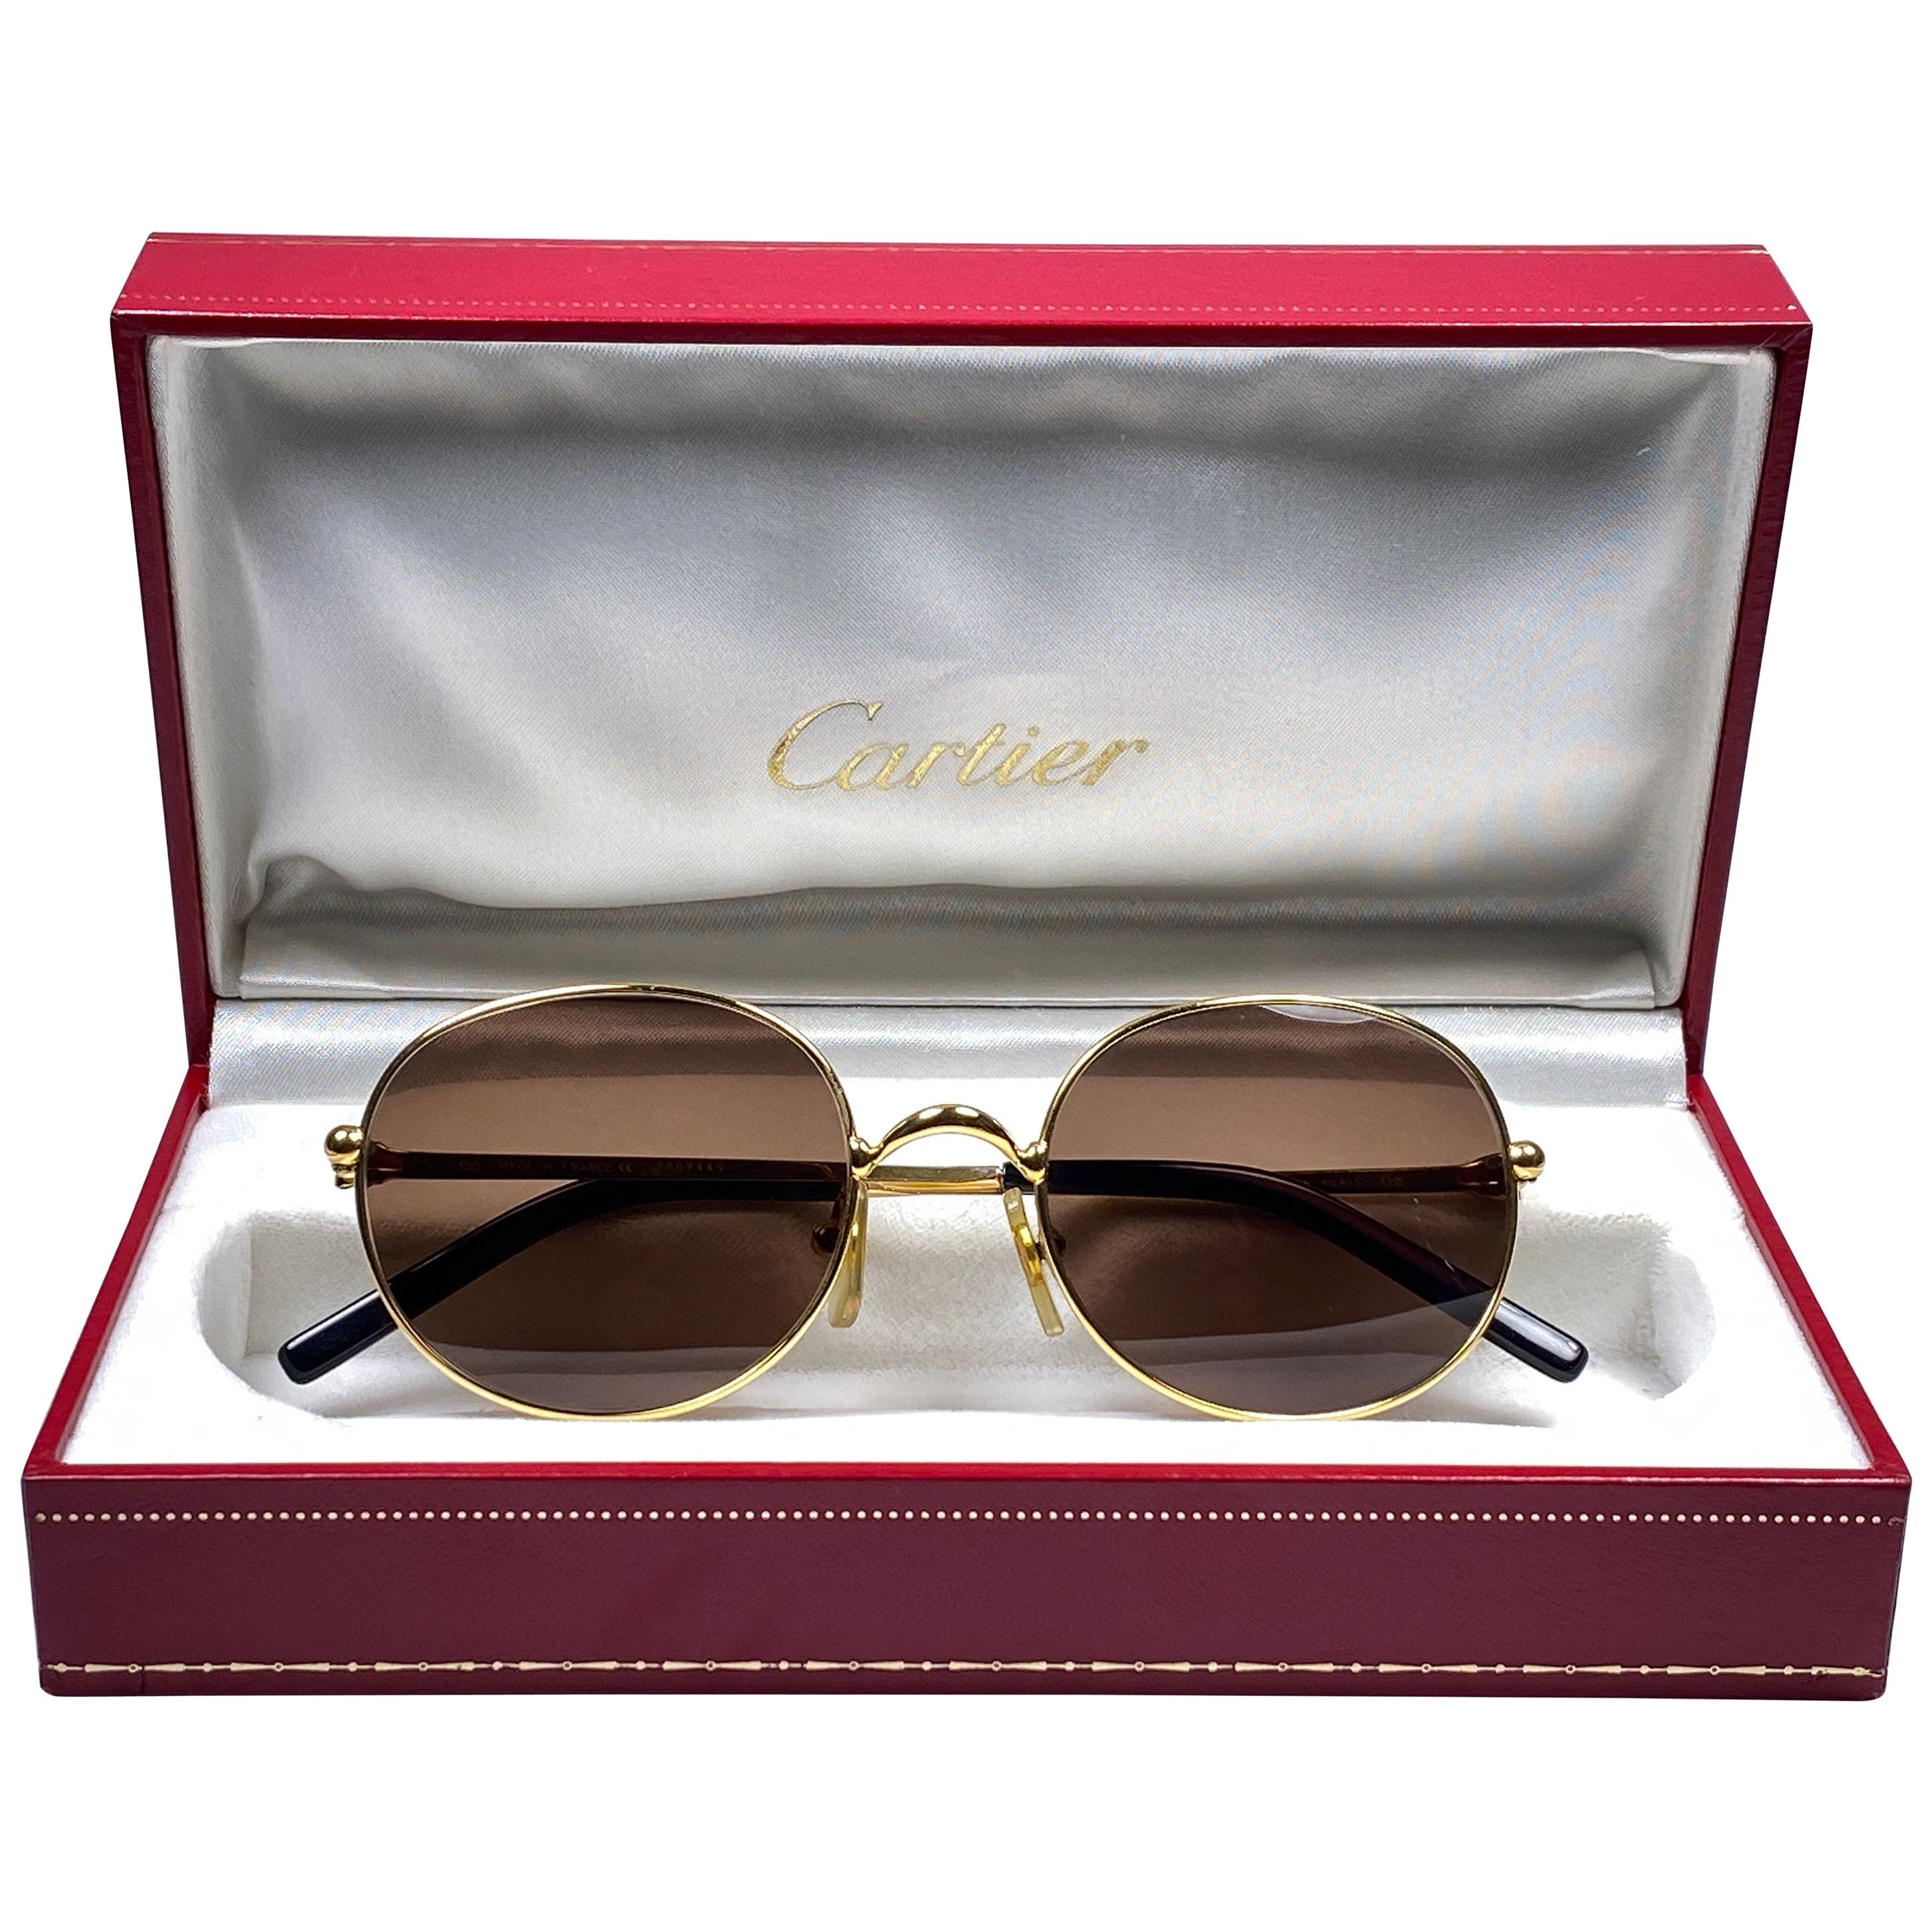 Vintage Cartier Oval Gold Antares 52mm Frame 18k Plated Sunglasses France